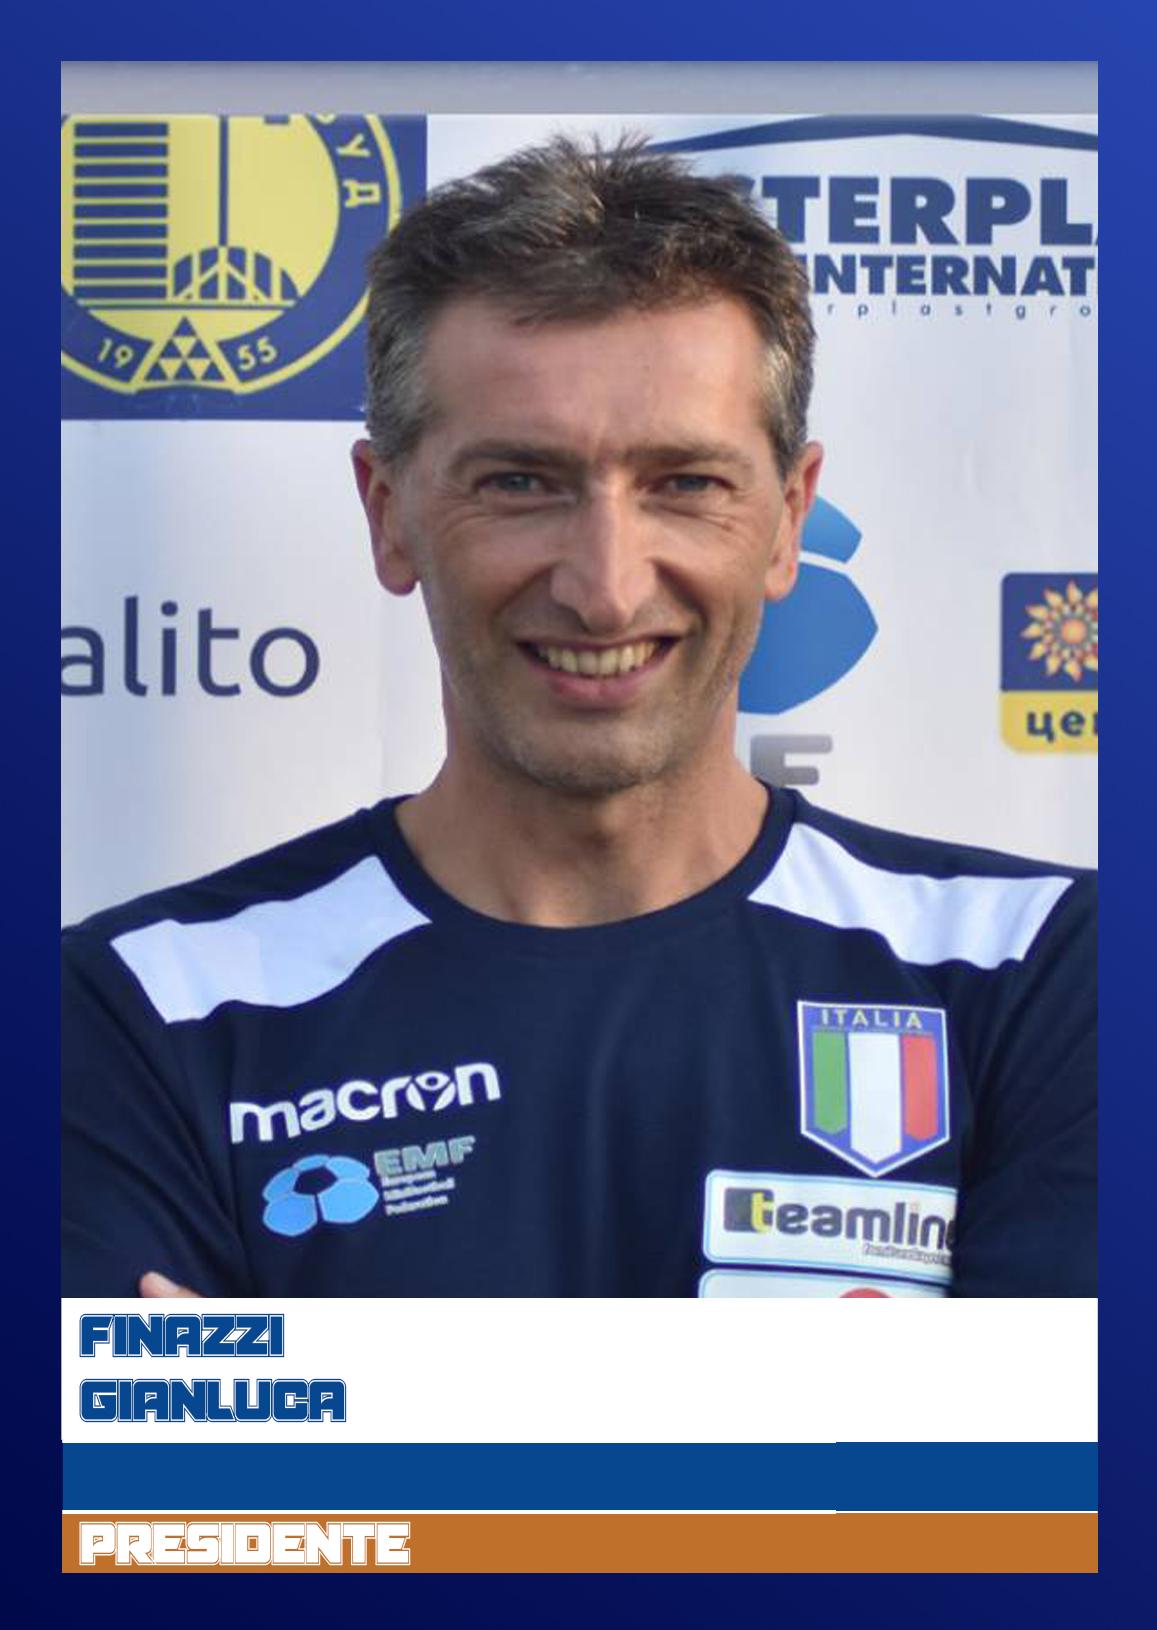 Gianluca Finazzi